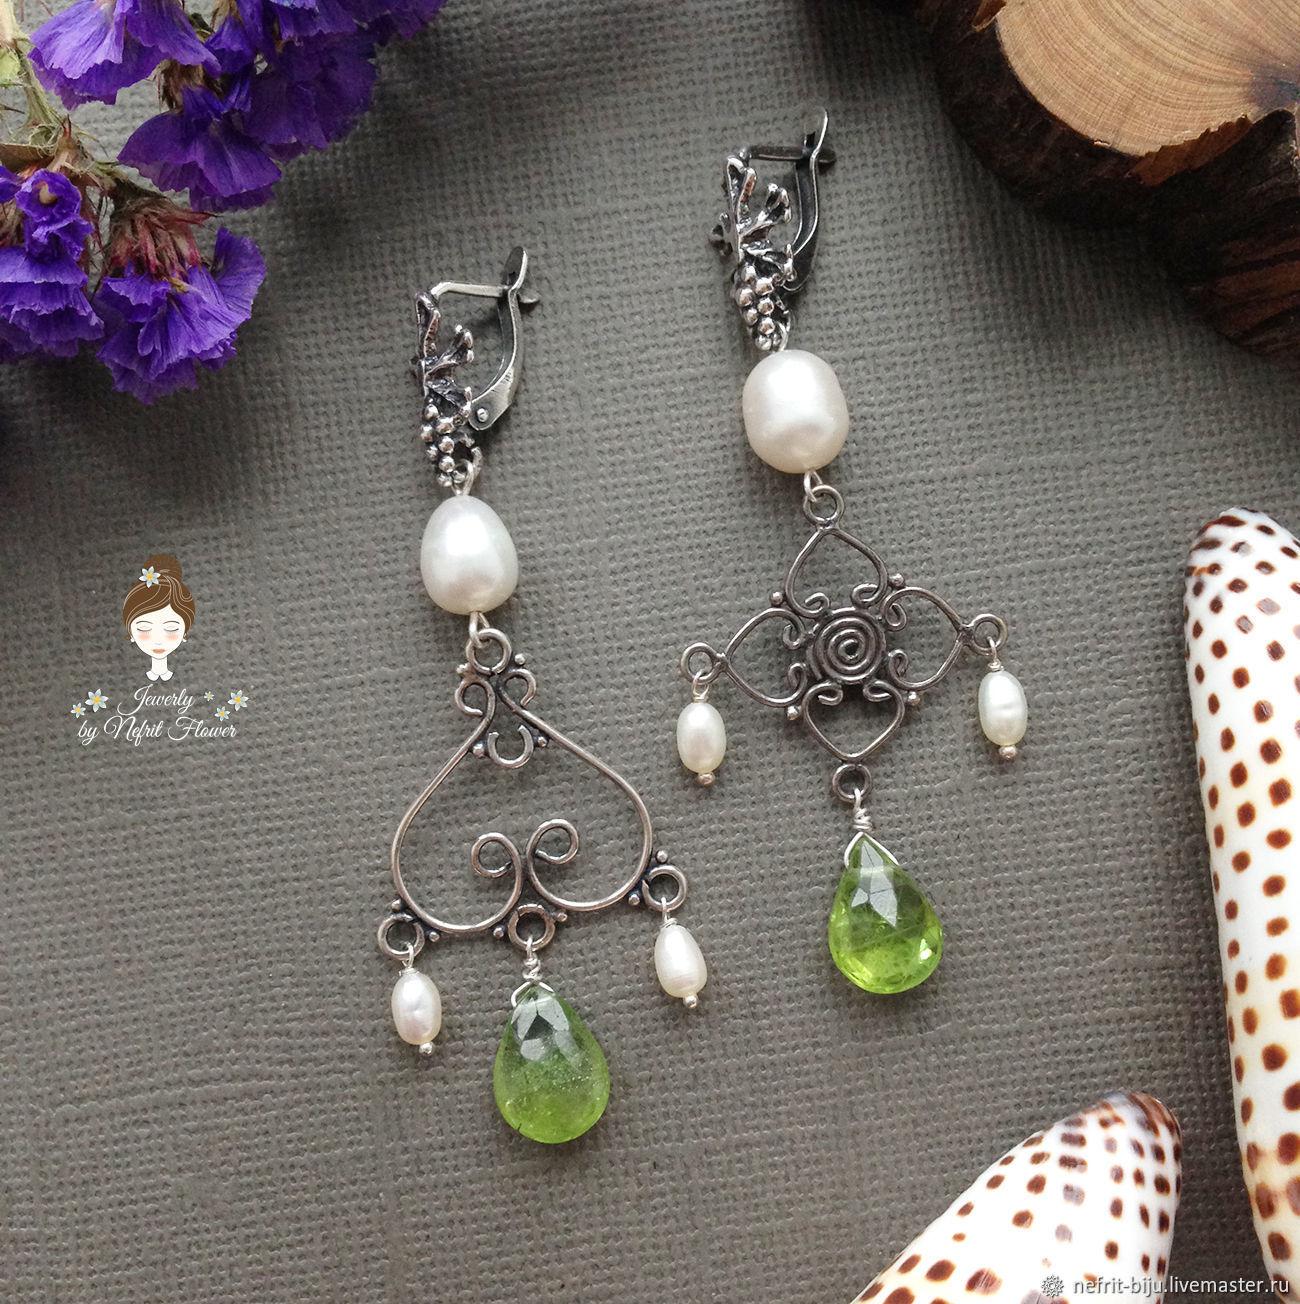 Asymmetric earrings 'Juicy Apple' pearl chrysolite silver, Earrings, St. Petersburg,  Фото №1